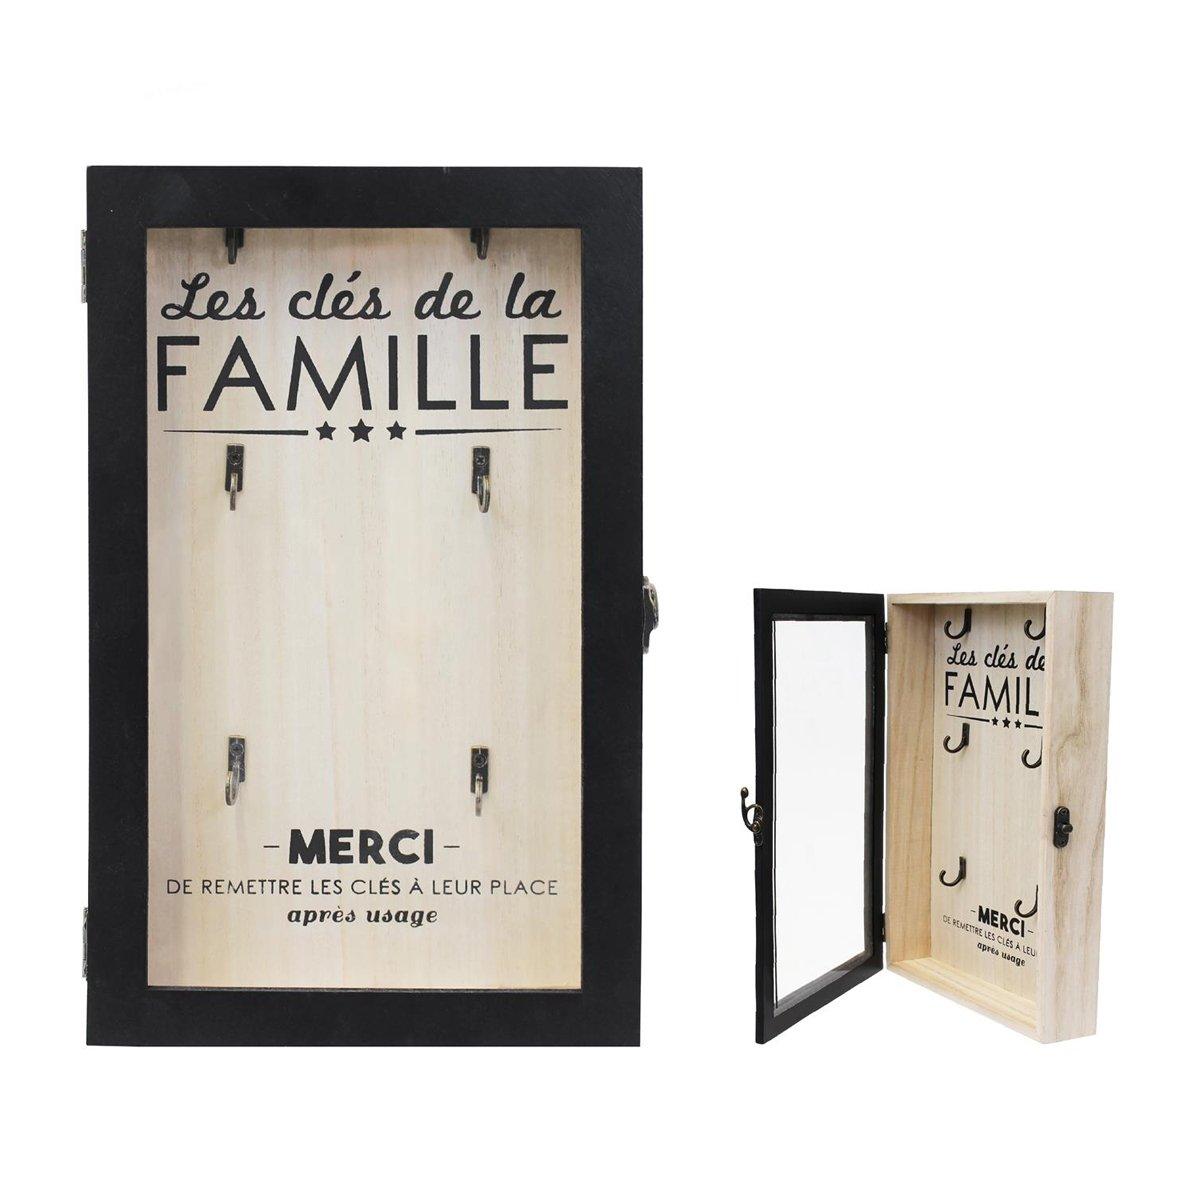 Les Tresors De Lily [Q0789] - Box yoghurt1008idxx wood 'Message' black beige (the family keywords)(6 hooks)- 30x19x5 cm (11.81''x7.48''x1.97'').